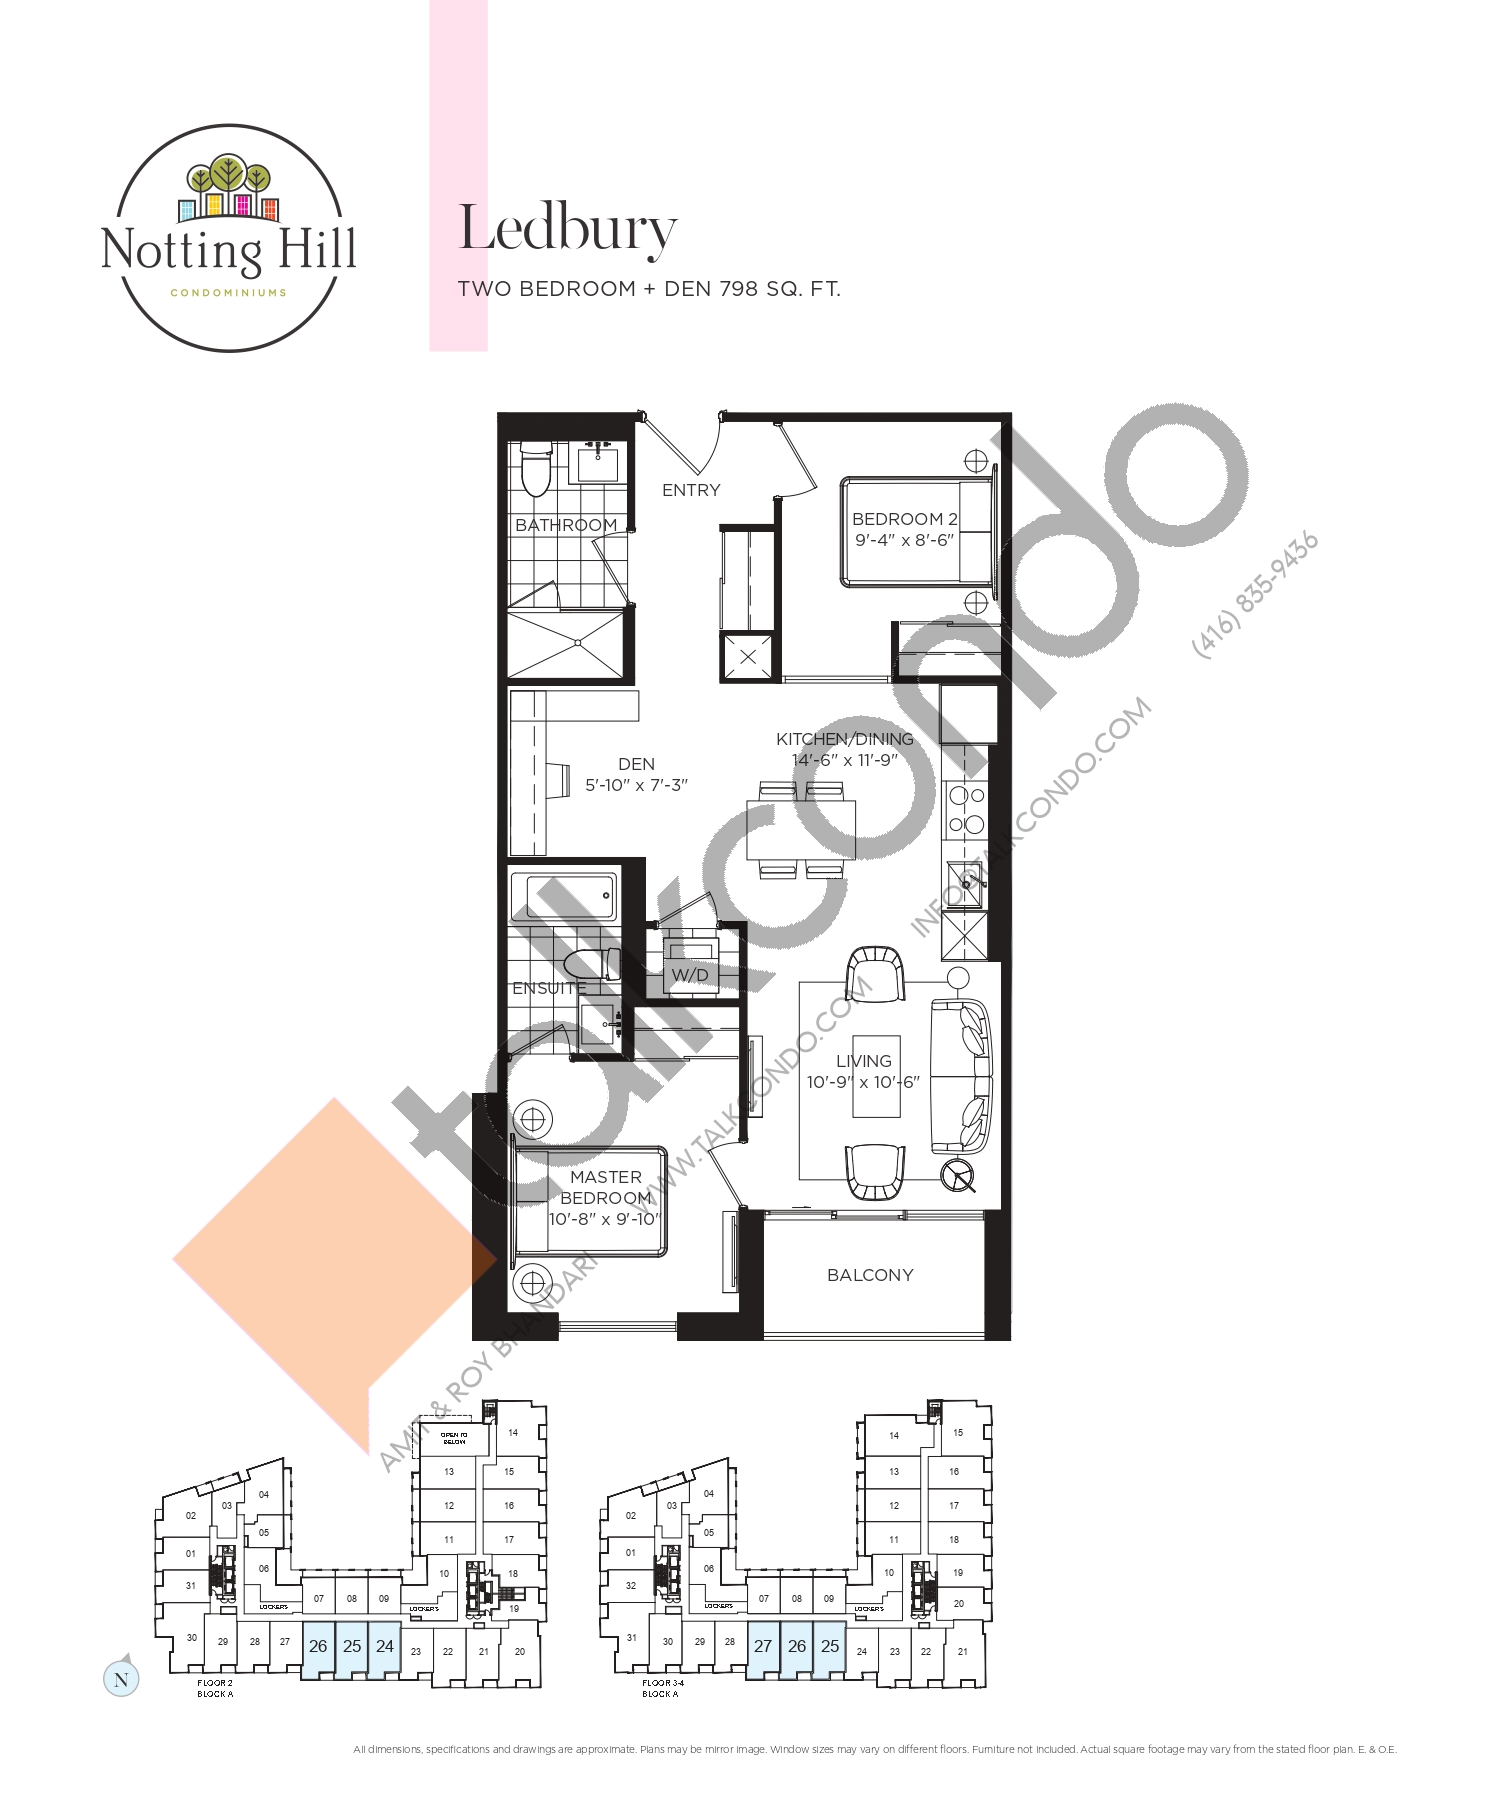 Ledbury Floor Plan at Notting Hill Phase 2 Condos - 798 sq.ft